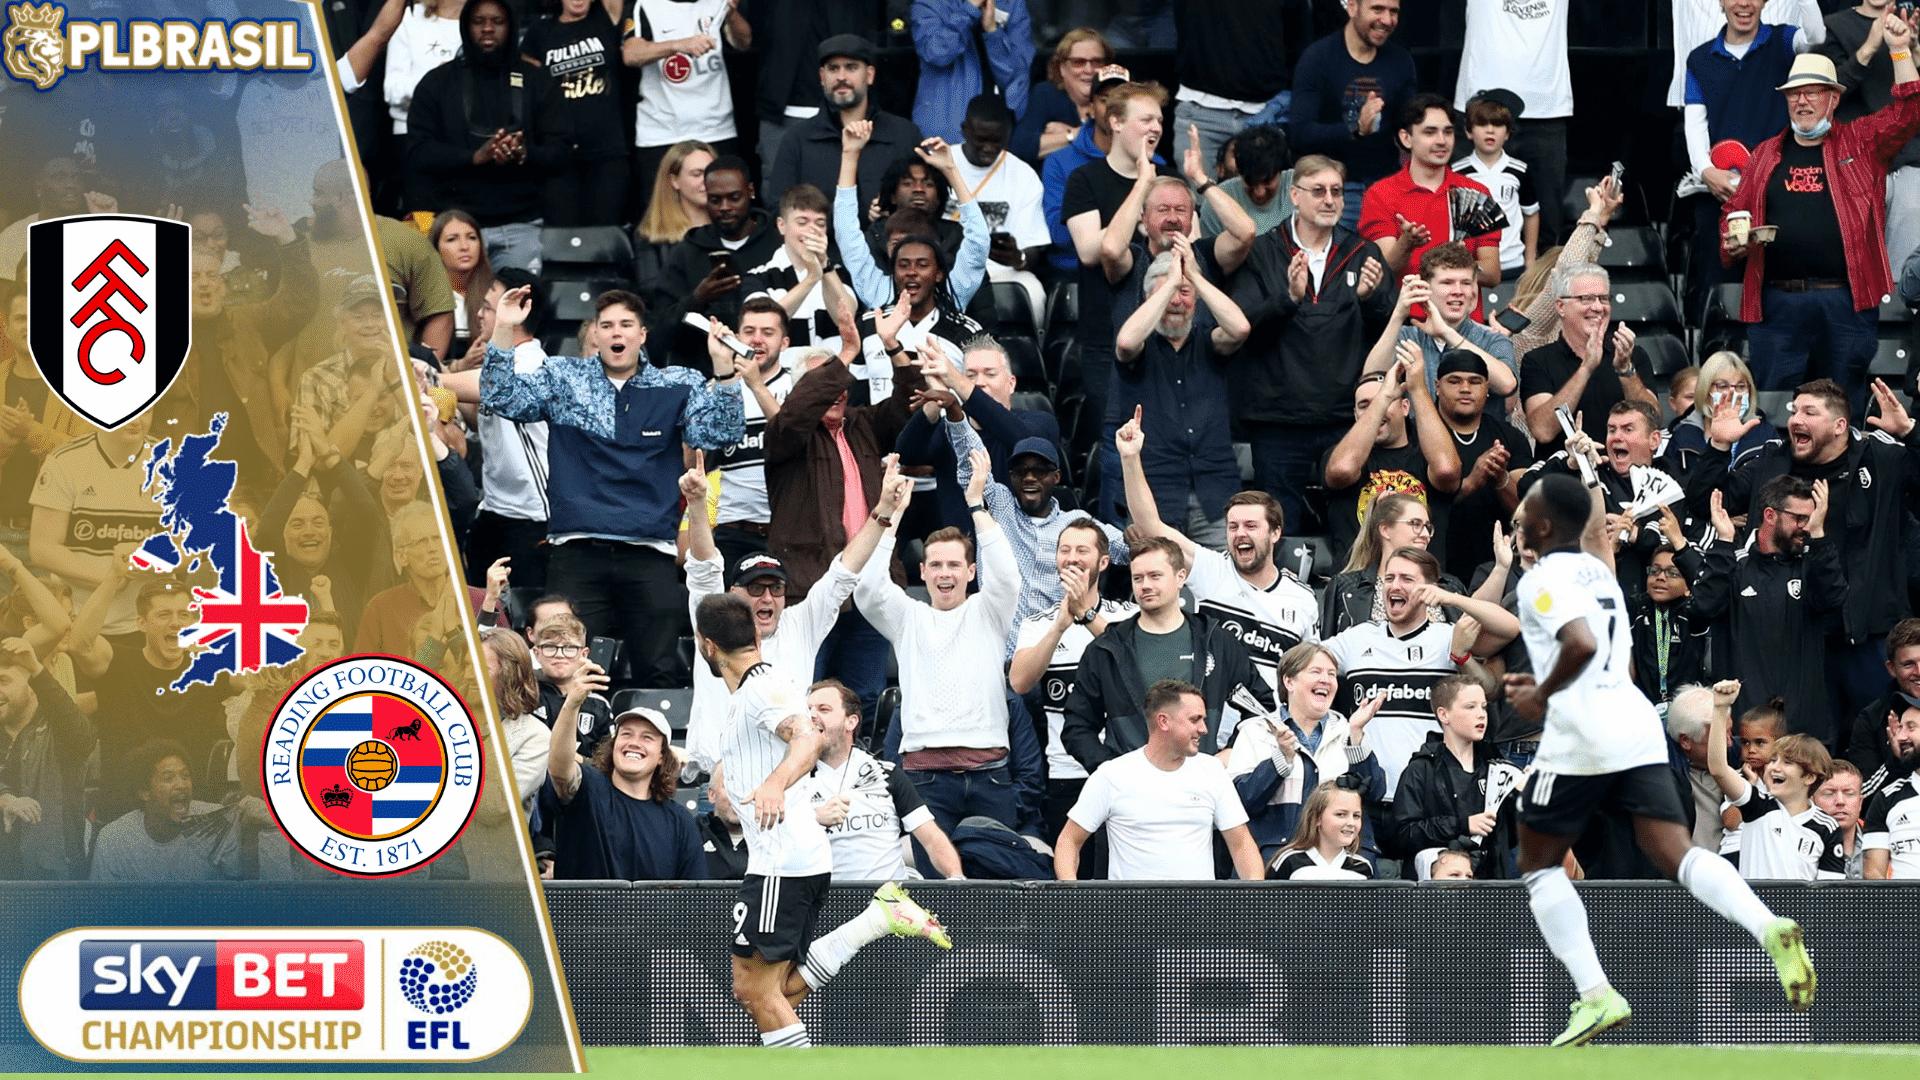 Palpites, Prognósticos e Odds para Fulham x Reading - 18/09